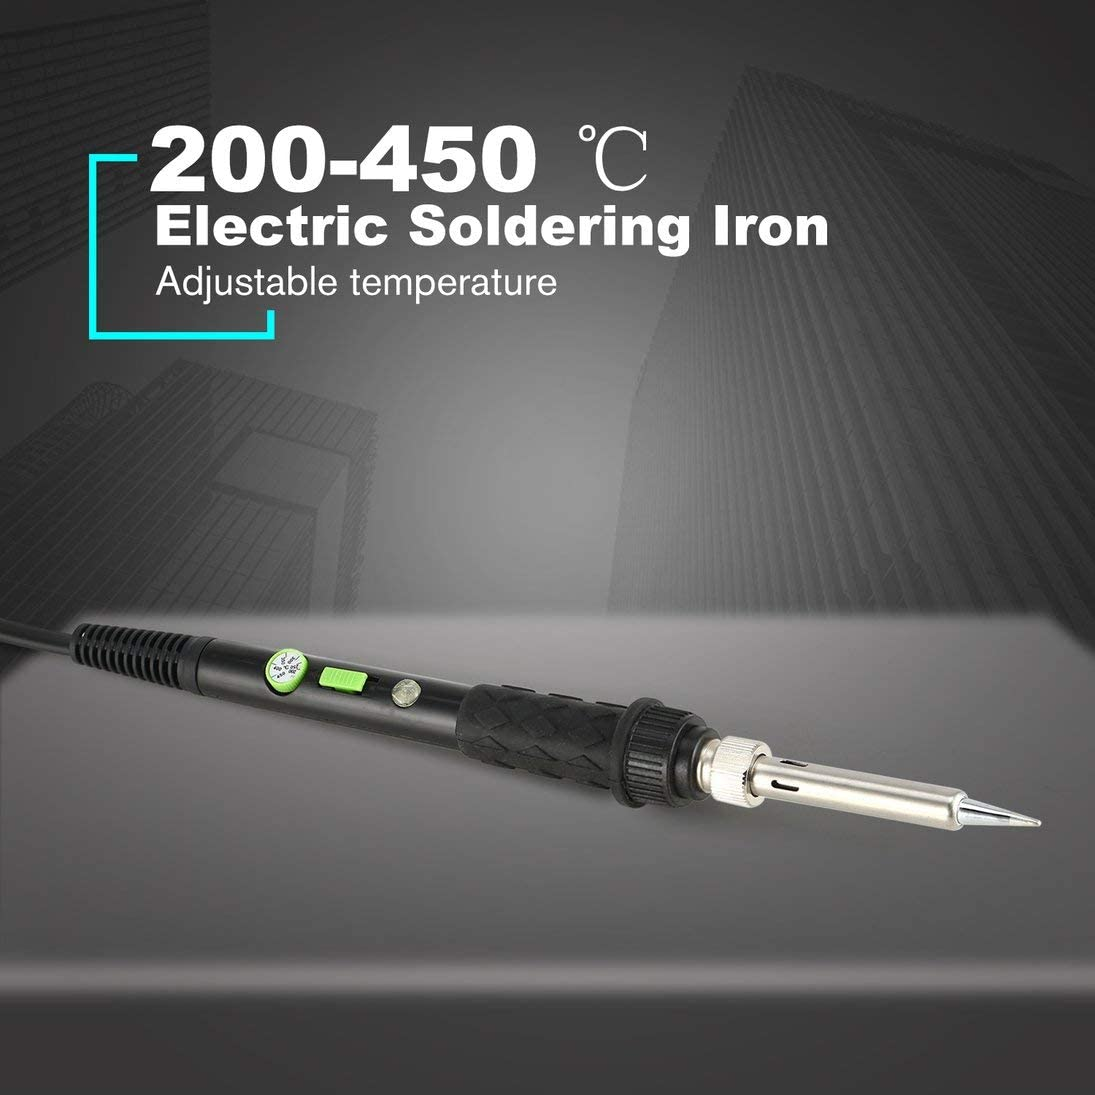 Schwarz Temperatureinstellung Elektrischer L/ötkolben Kit Schalter Power Welding Repair Tools L/ötstation Heat Soldering Pencil Tool Kit